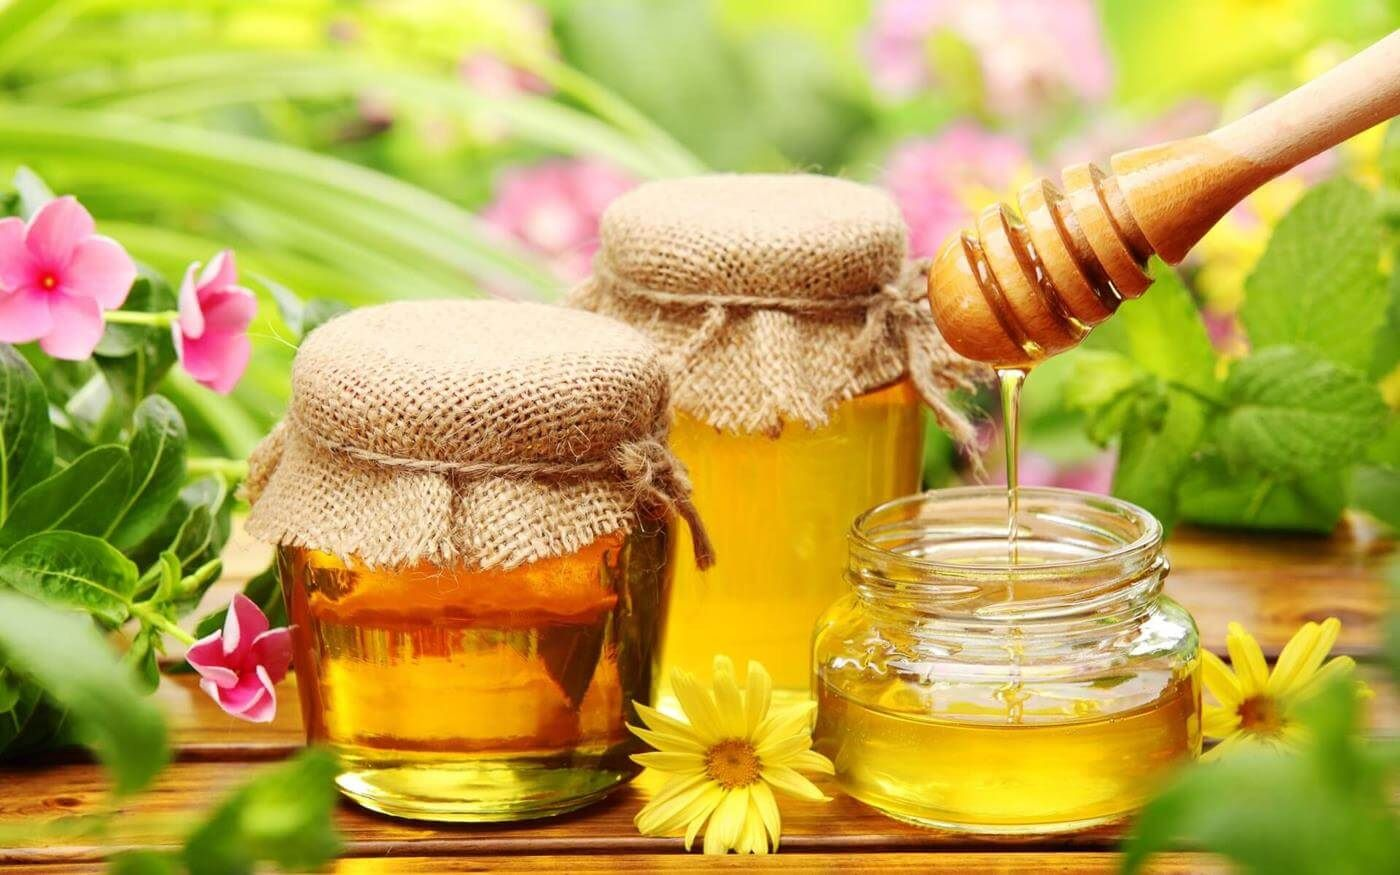 Sustitutos de azúcar impresionantes naturales, alternativas de azúcar